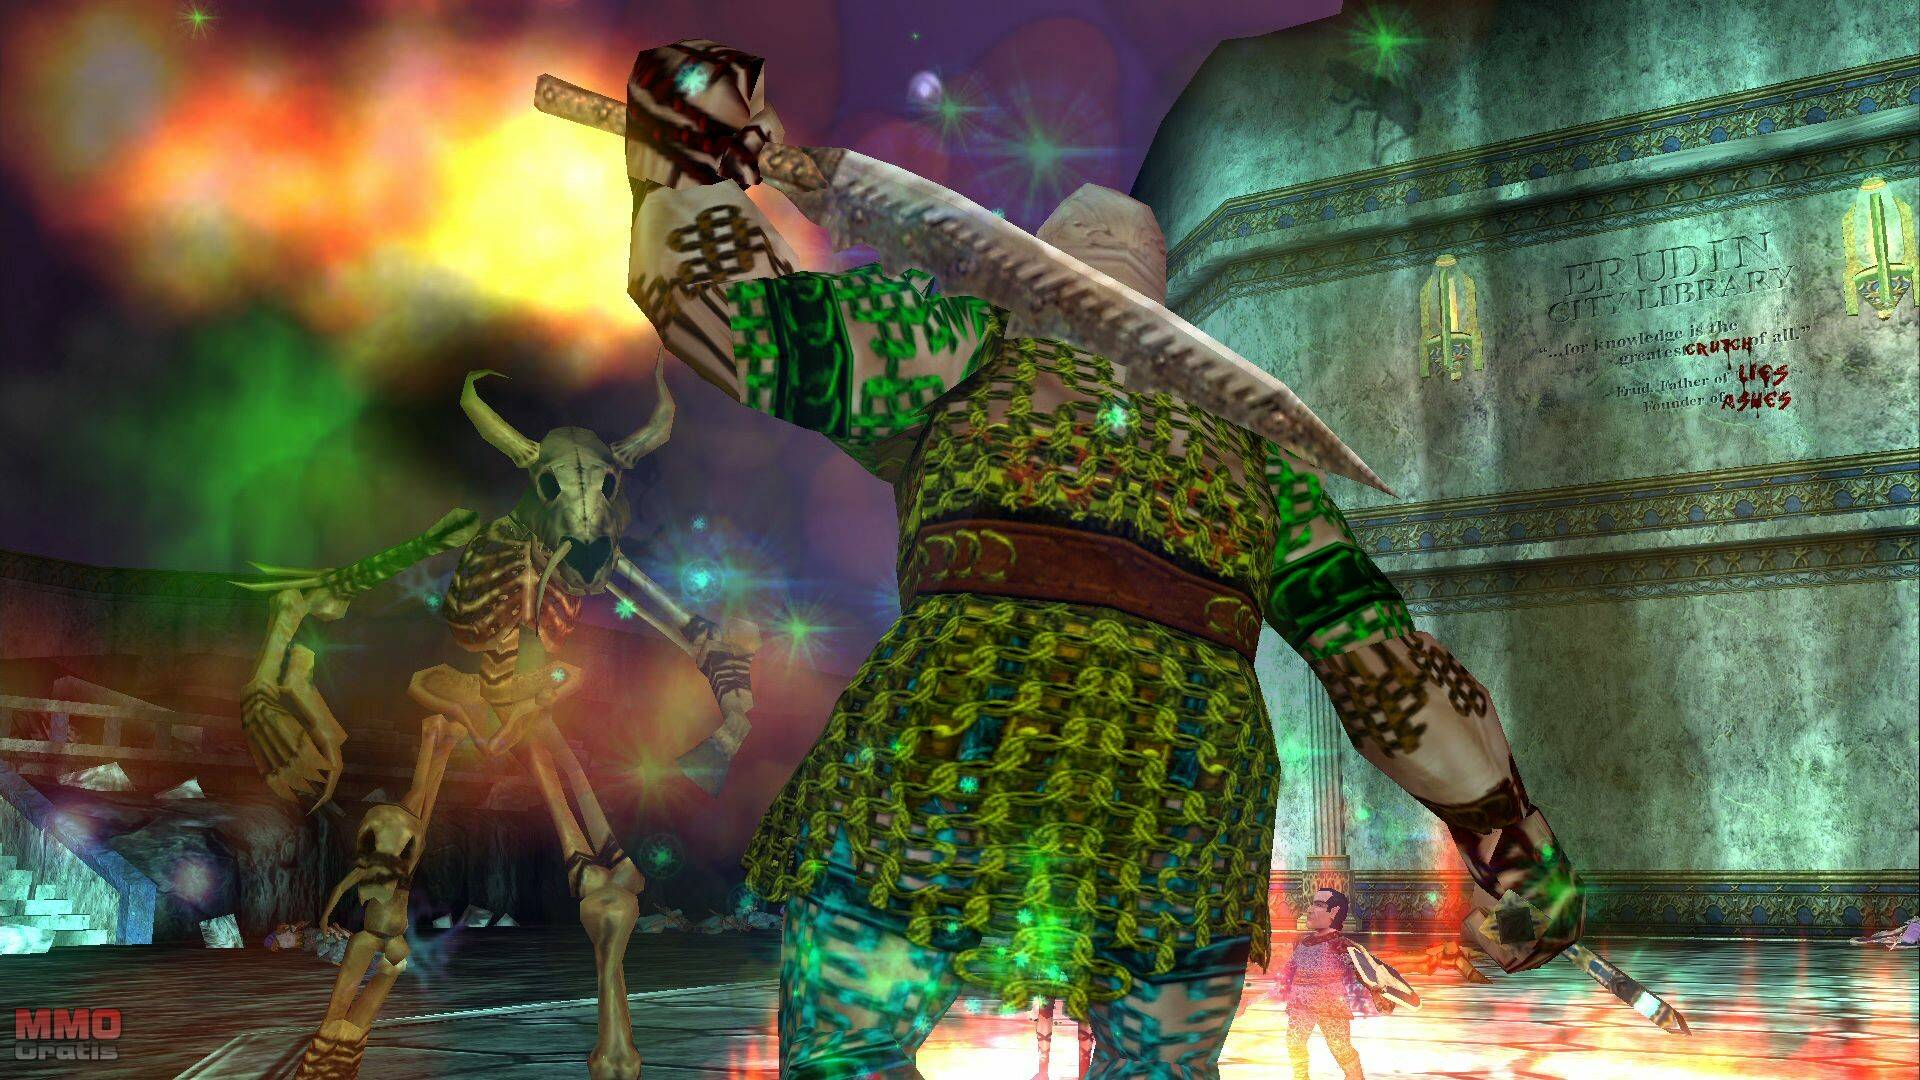 Imagenes de Everquest